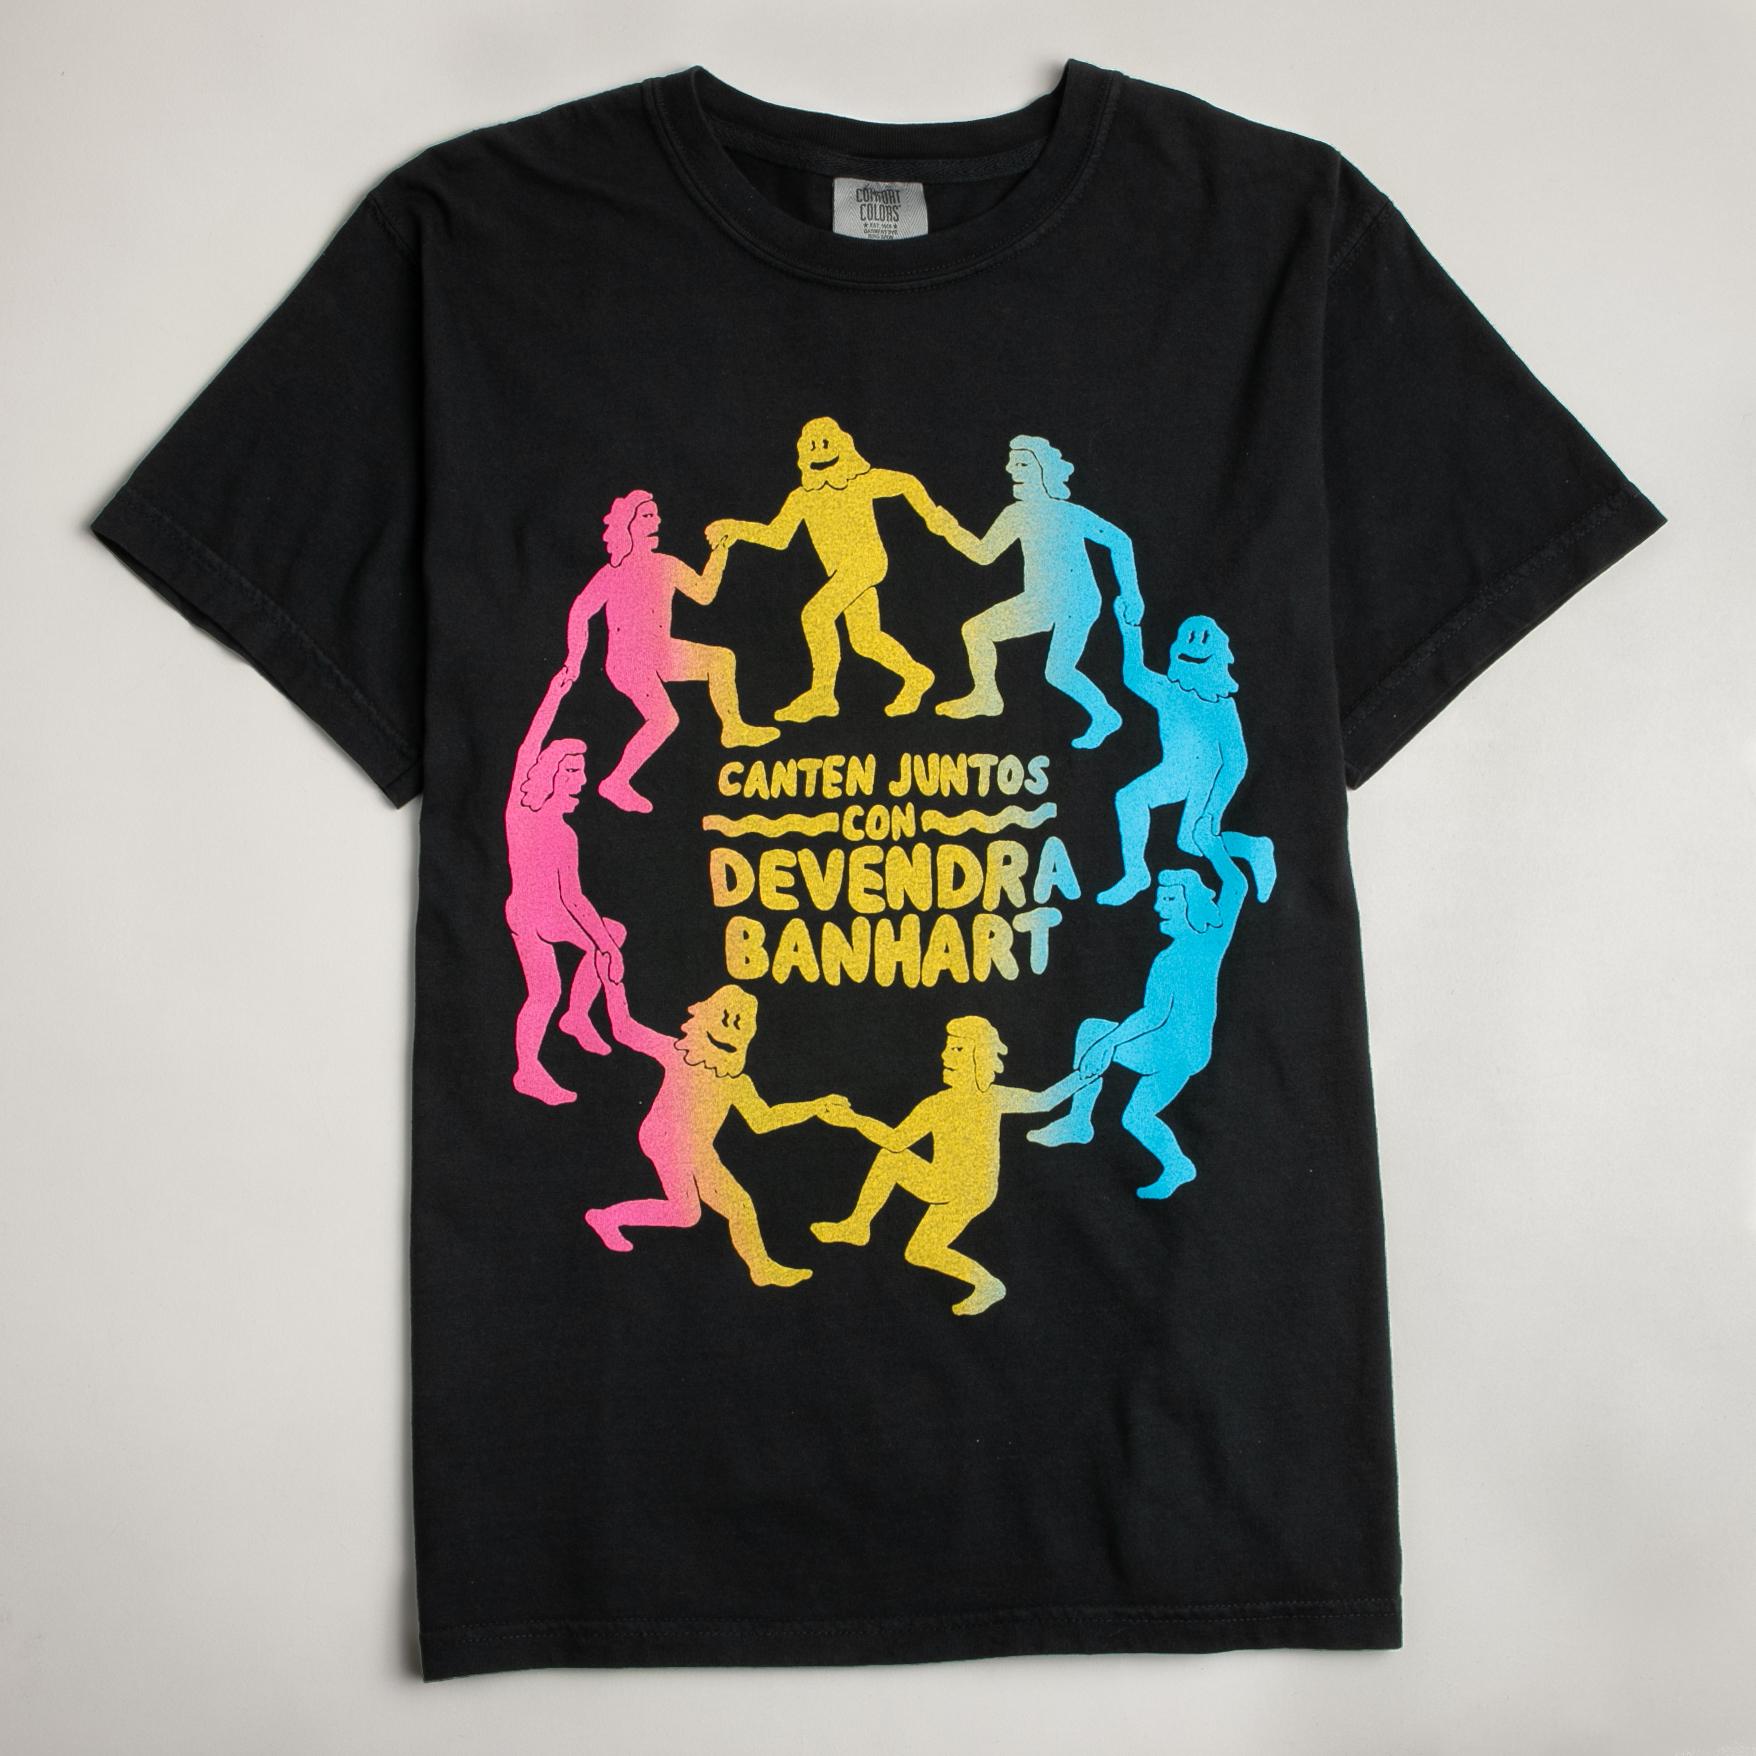 Circle Dance Shirt Rainbow - Devendra Banhart